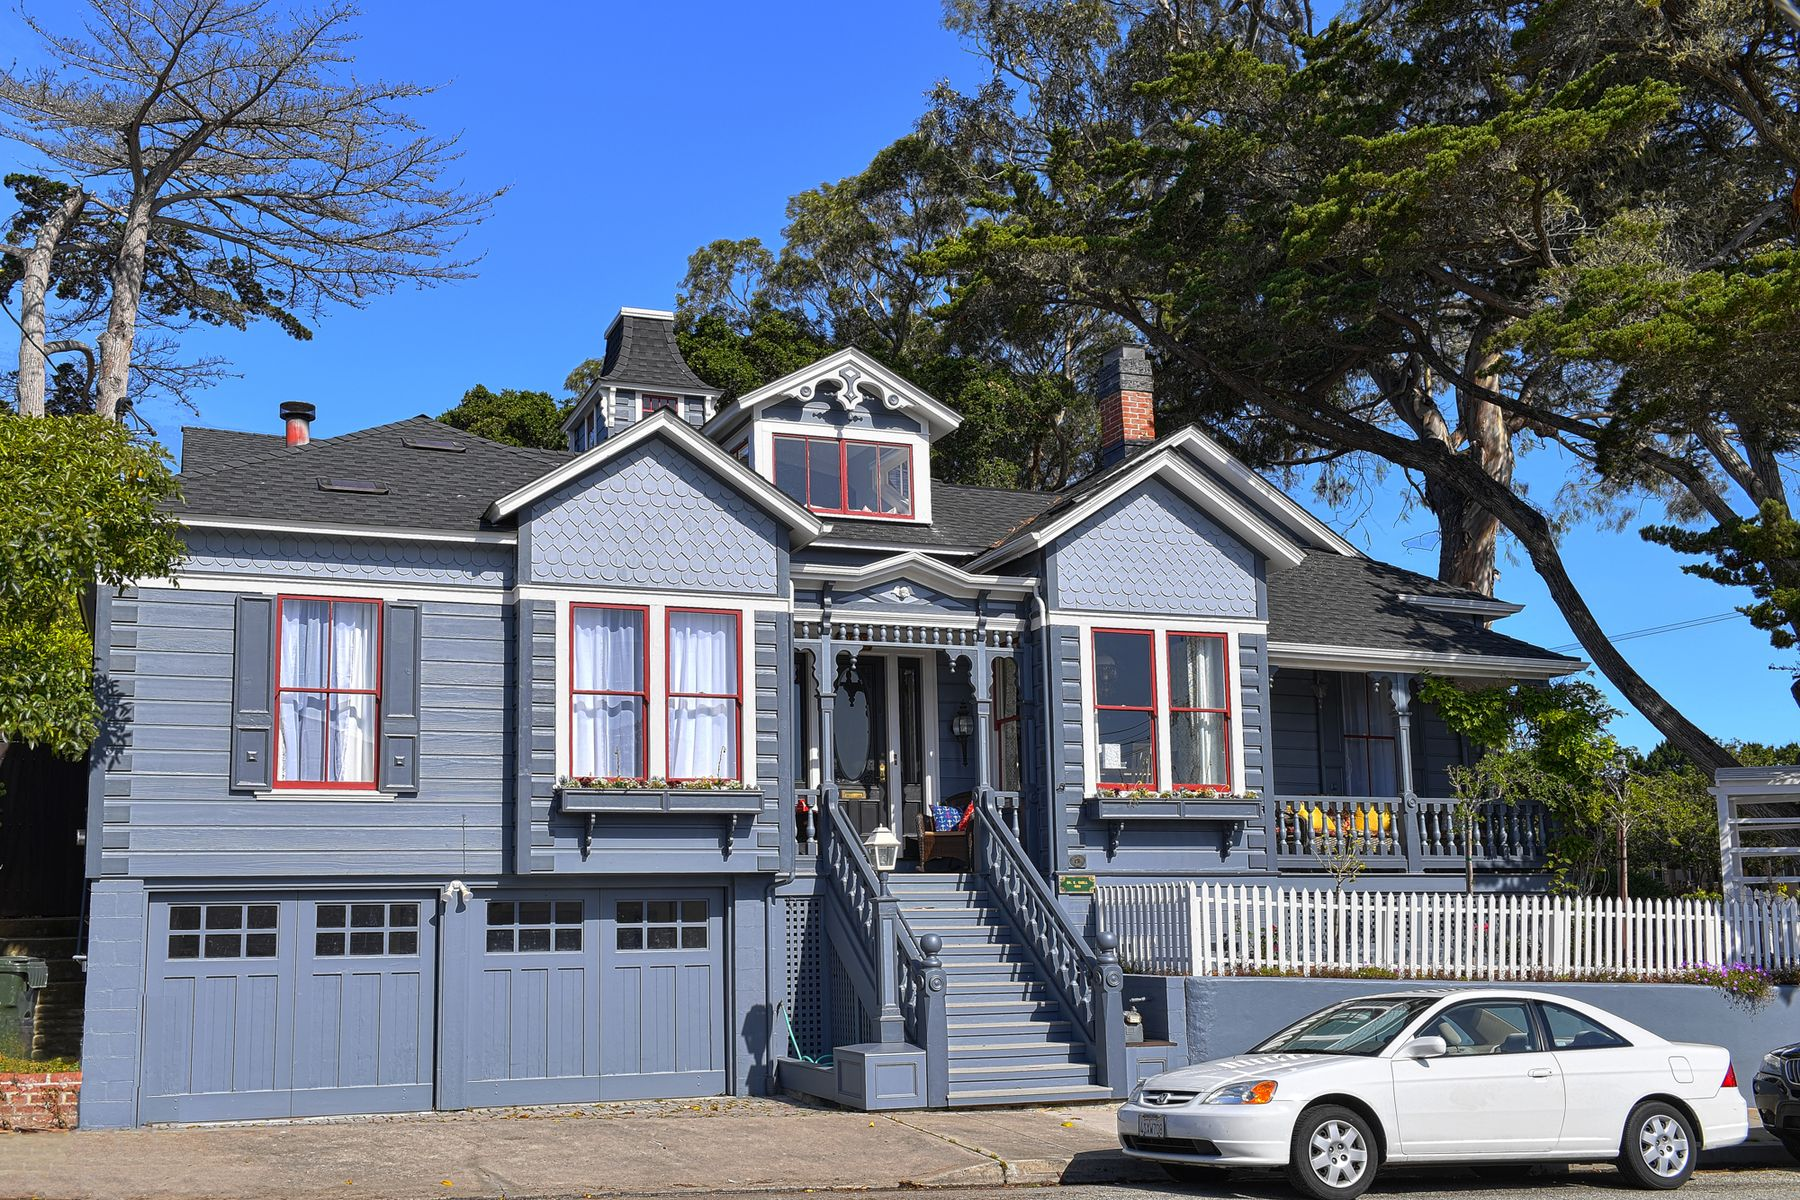 Single Family Homes for Sale at Elegant 5 Bedroom/4.5 Bath Home! 202 Lobos Avenue Pacific Grove, California 93950 United States